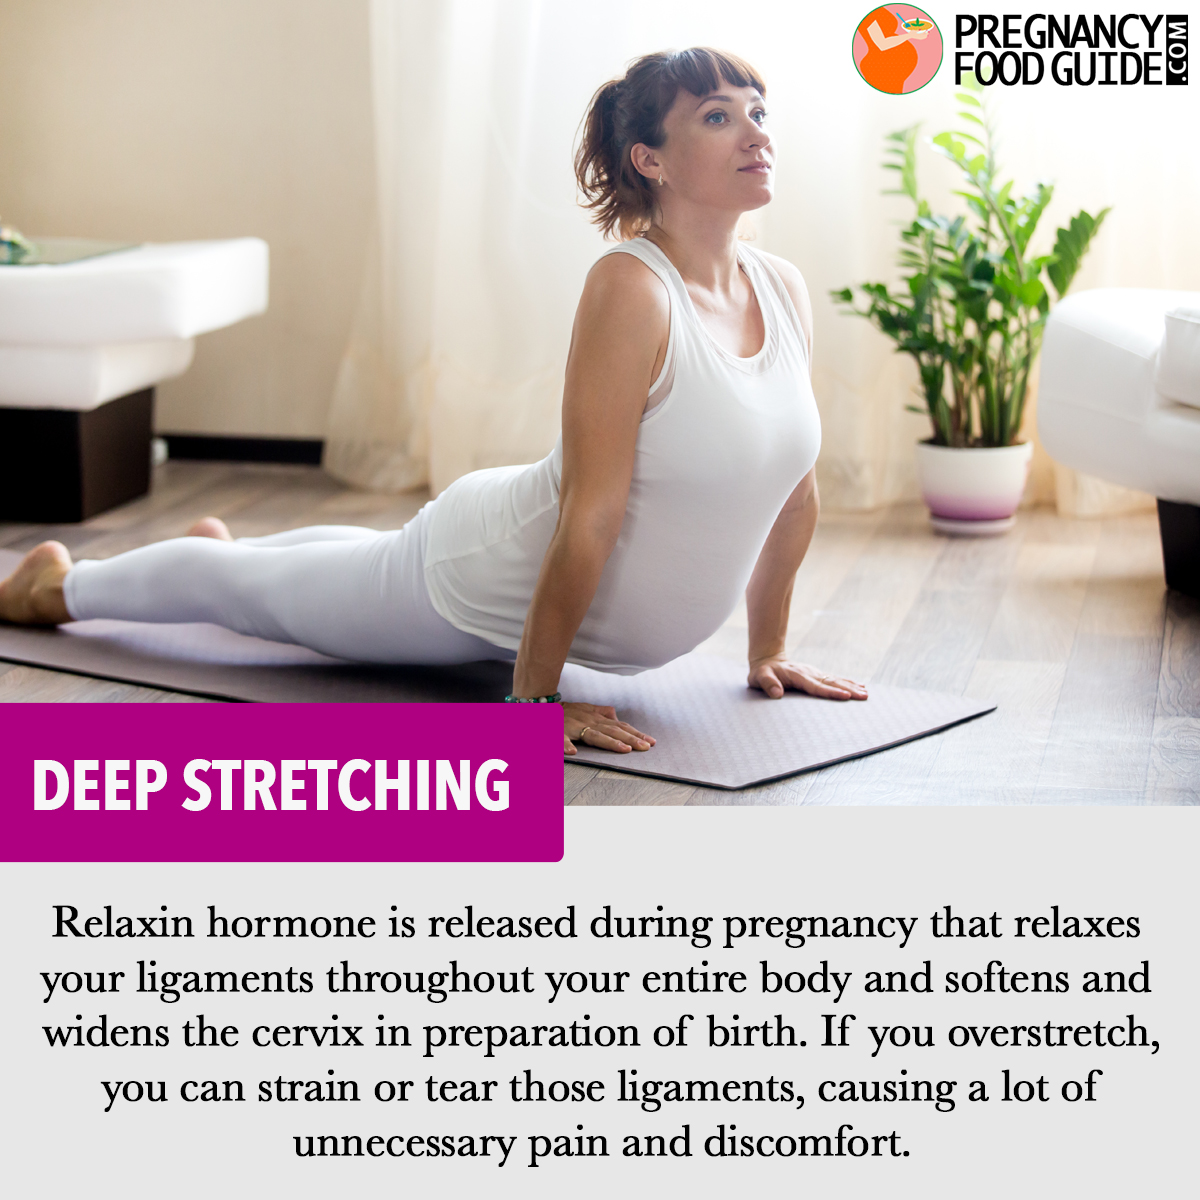 deep stretching